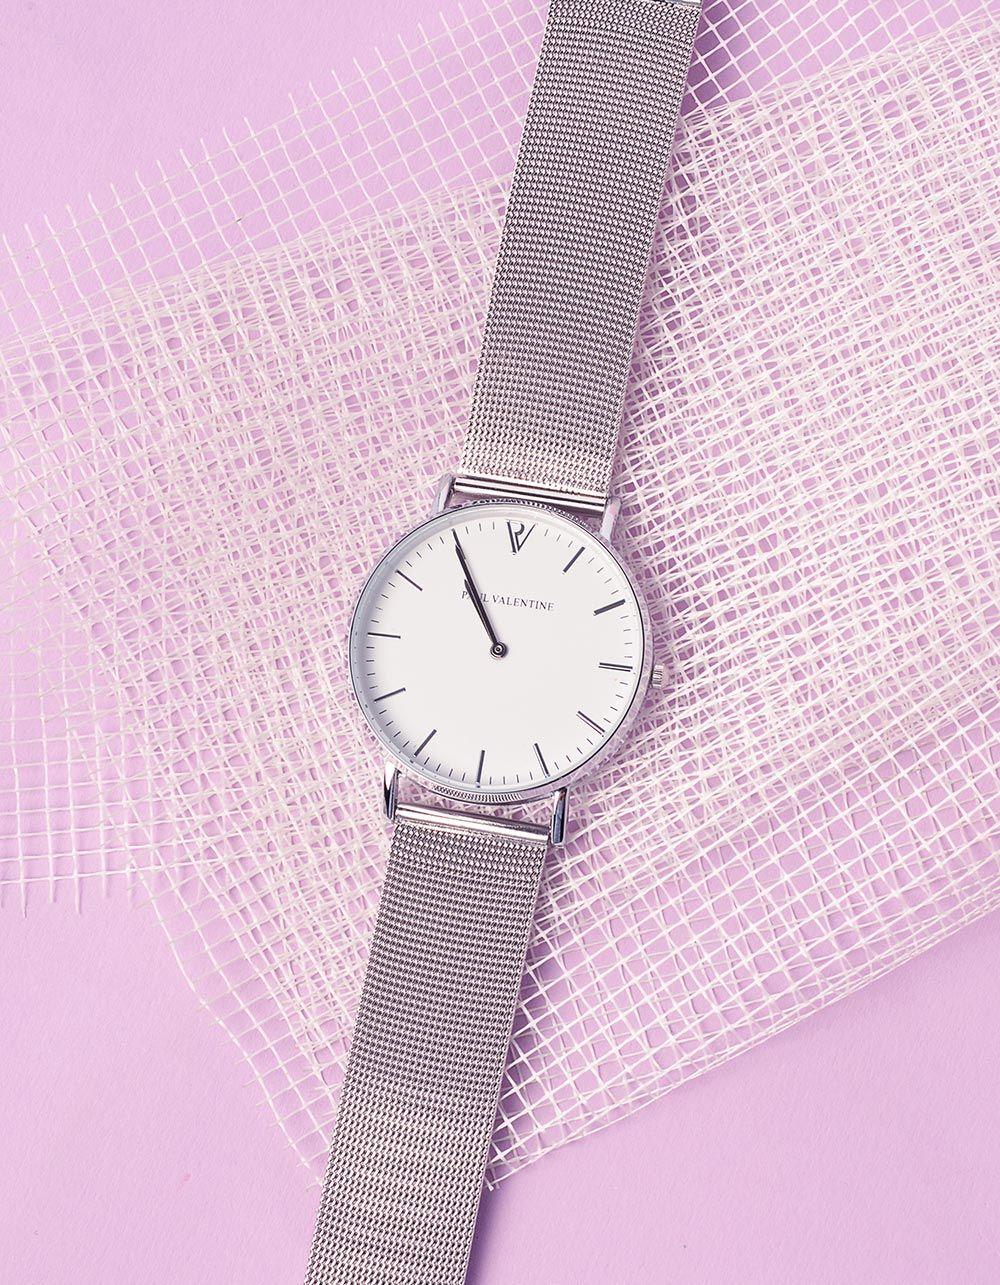 Годинник на руку з круглим циферблатом | 237302-06-XX